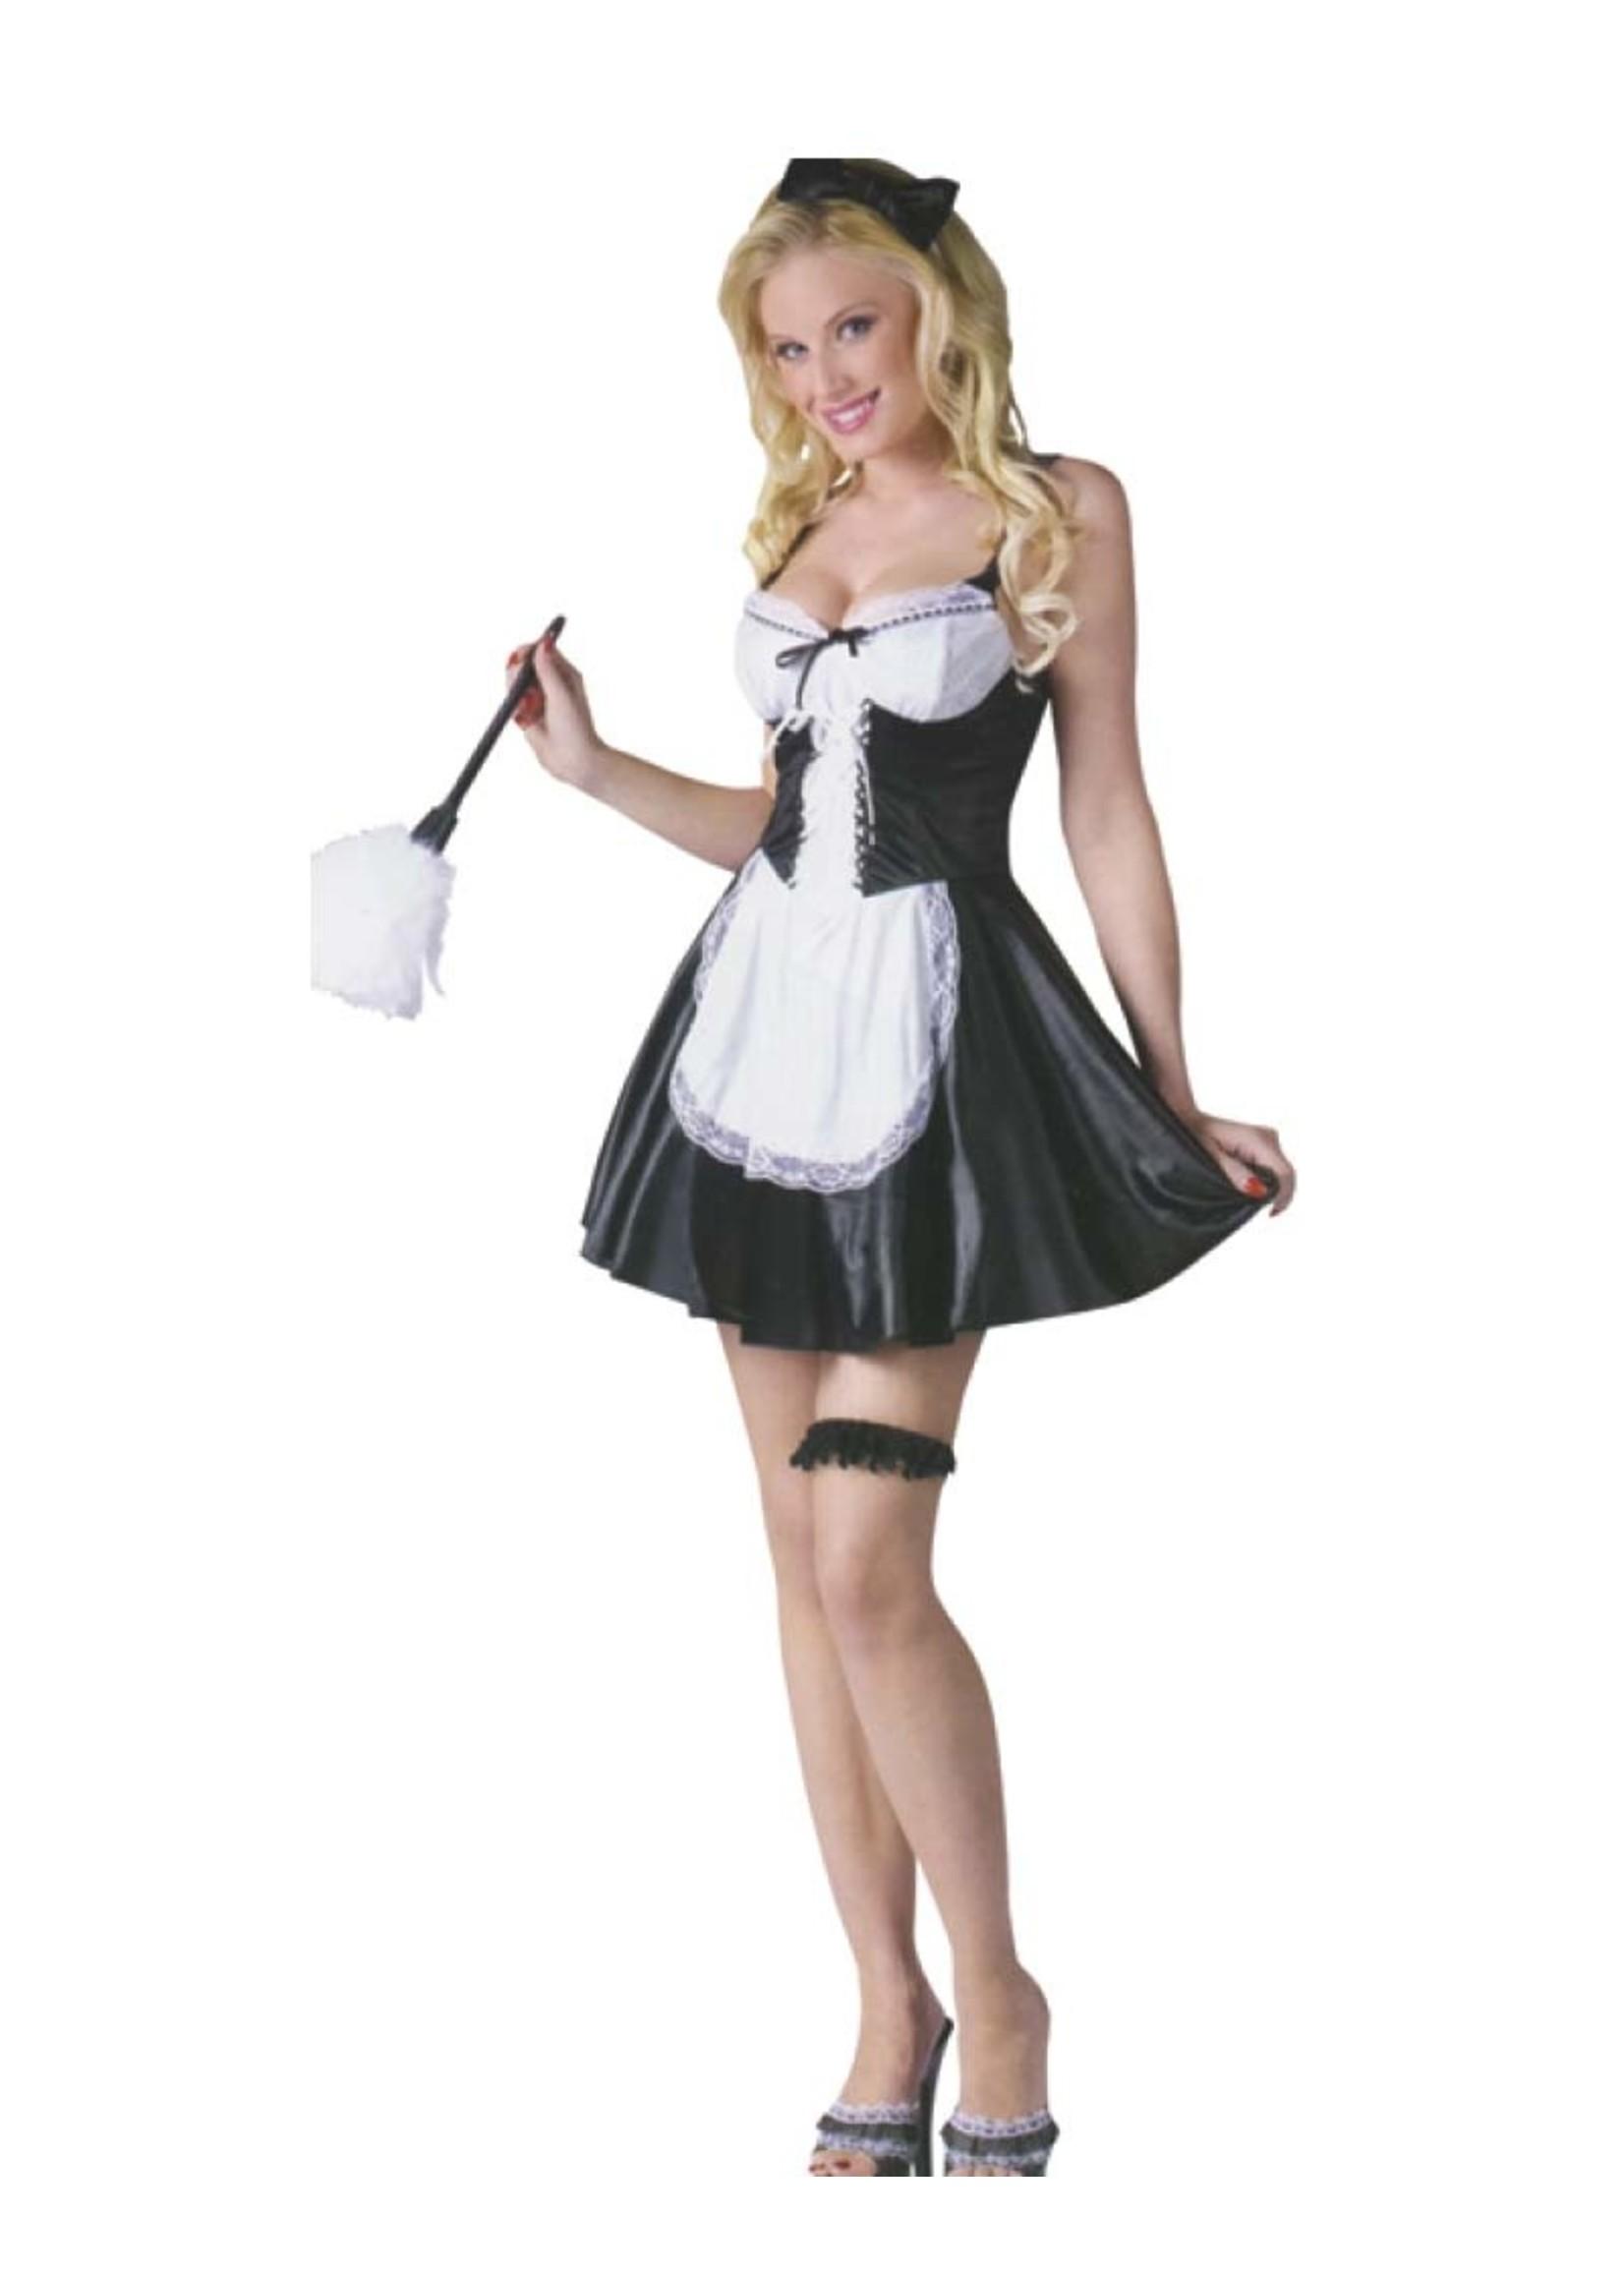 French Maid - Women's